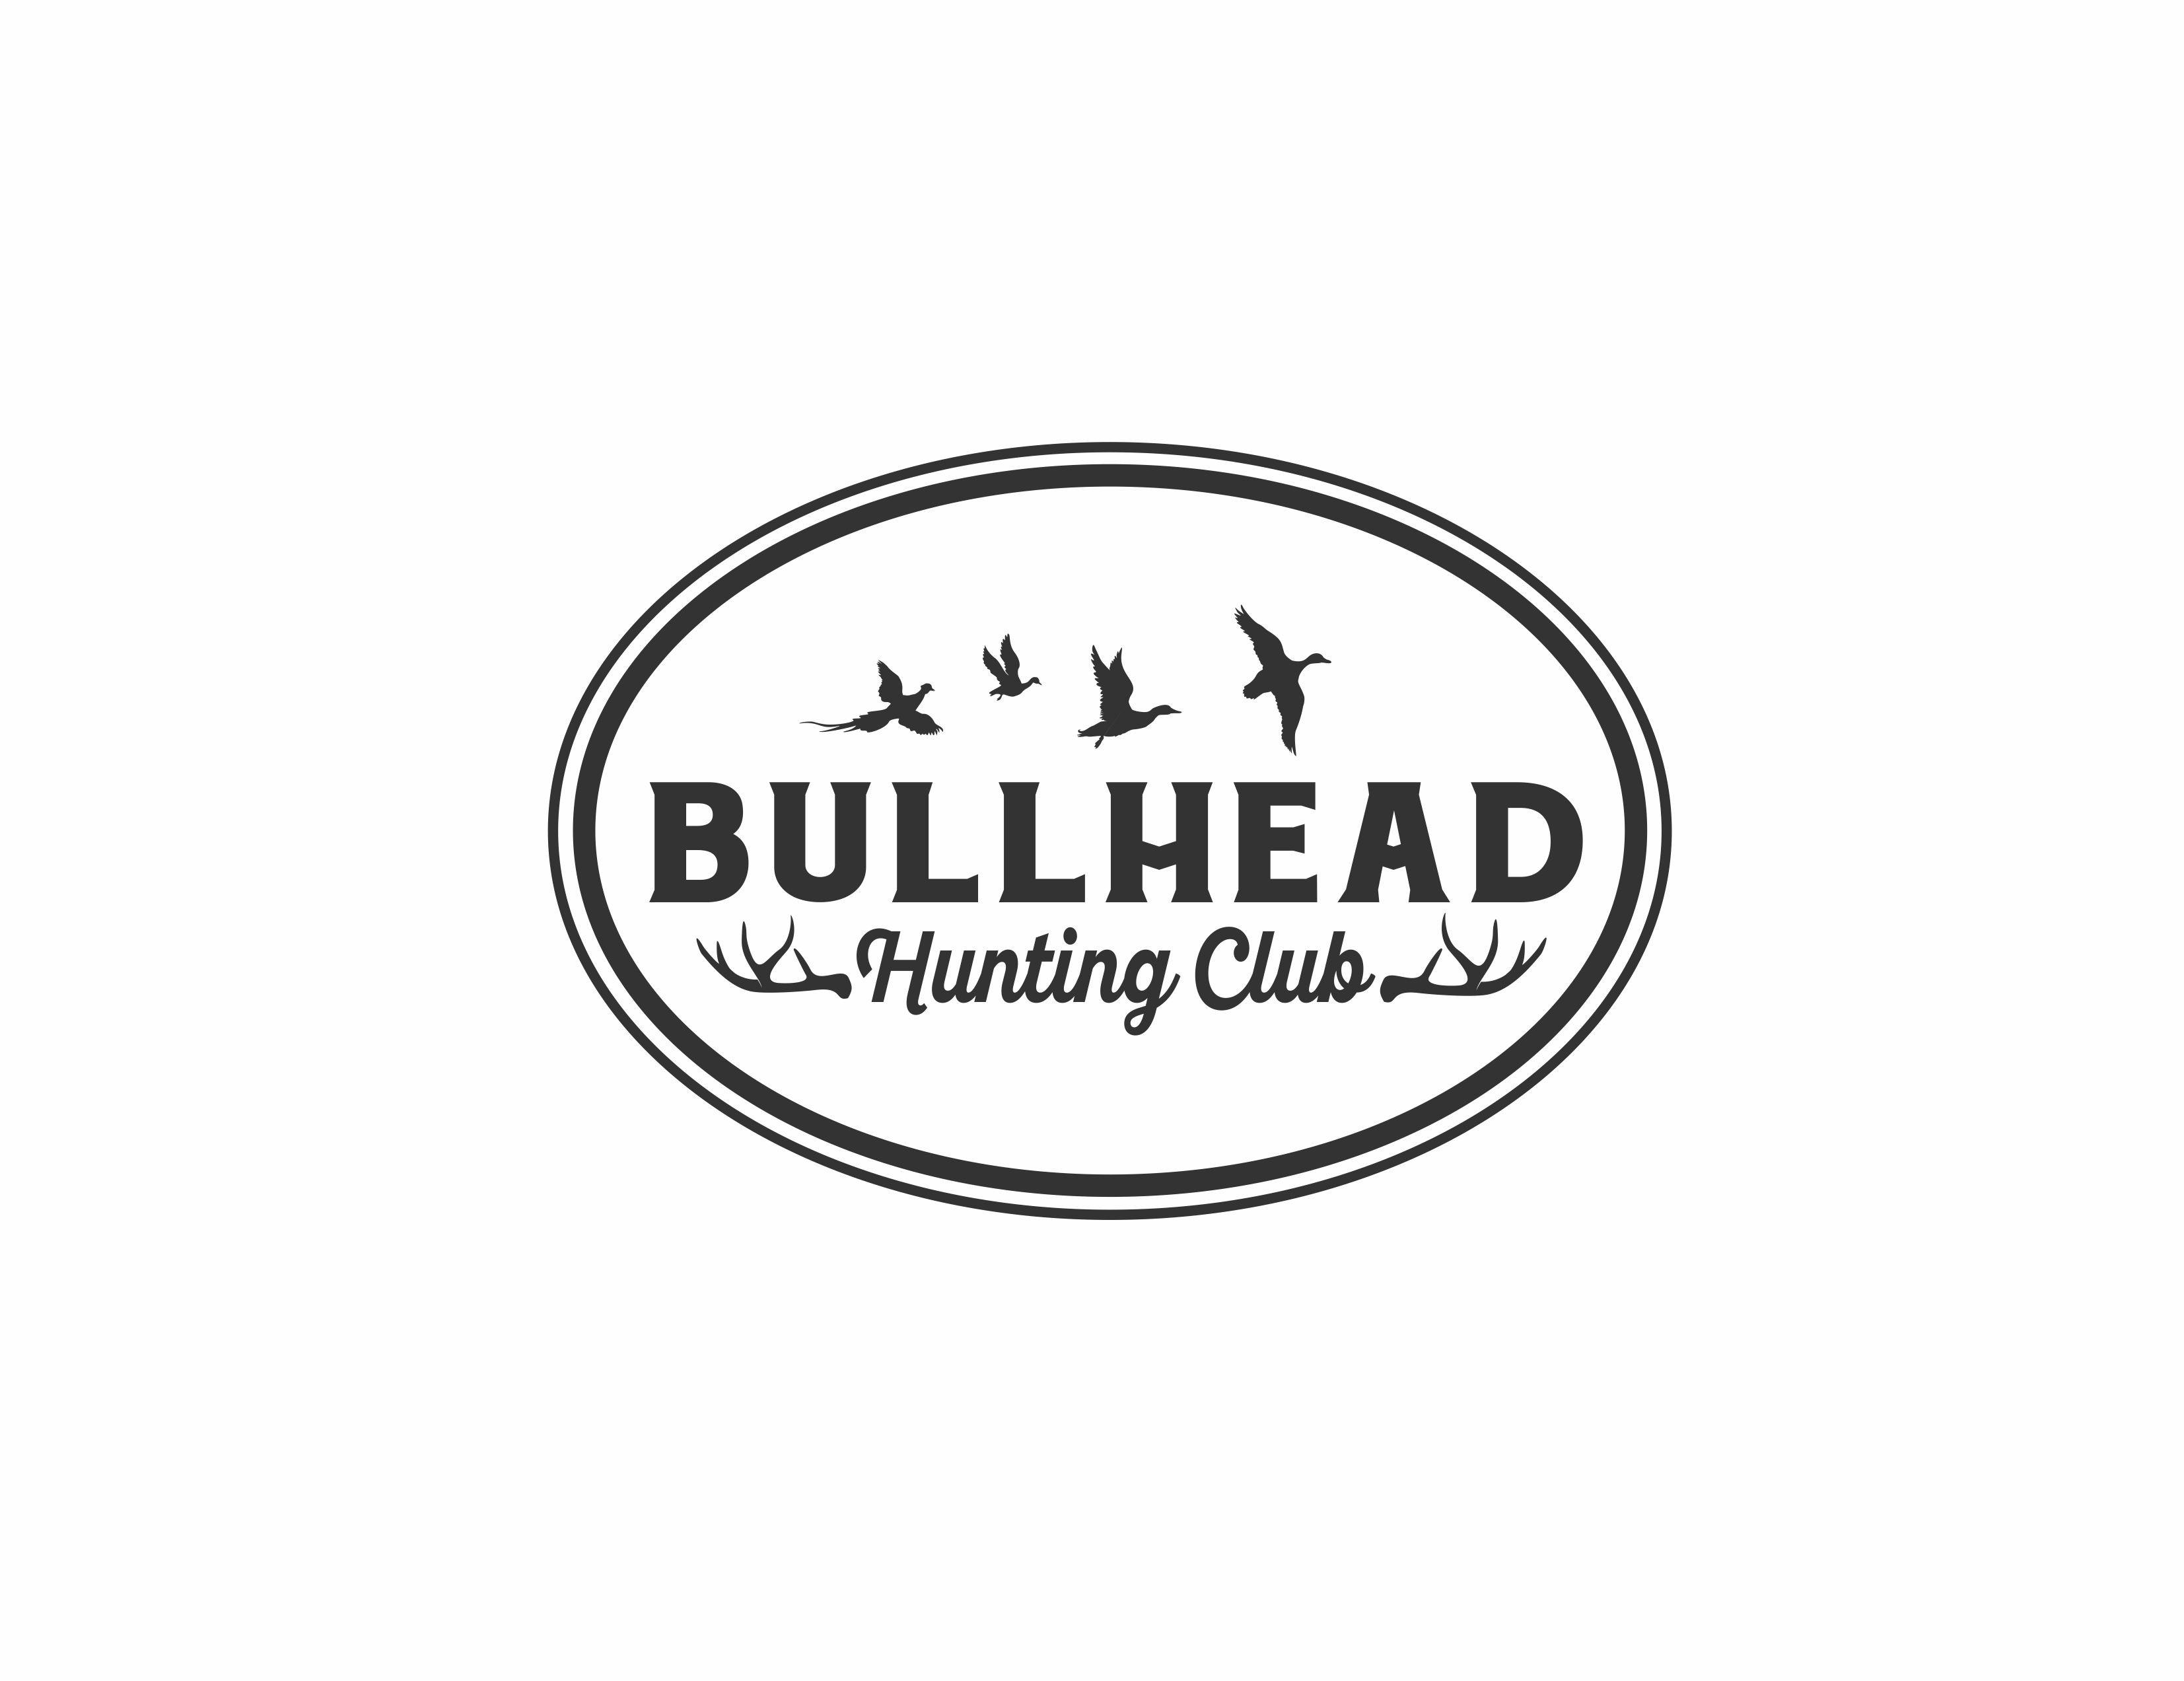 Design a bird hunting logo for Bullhead Hunting Club